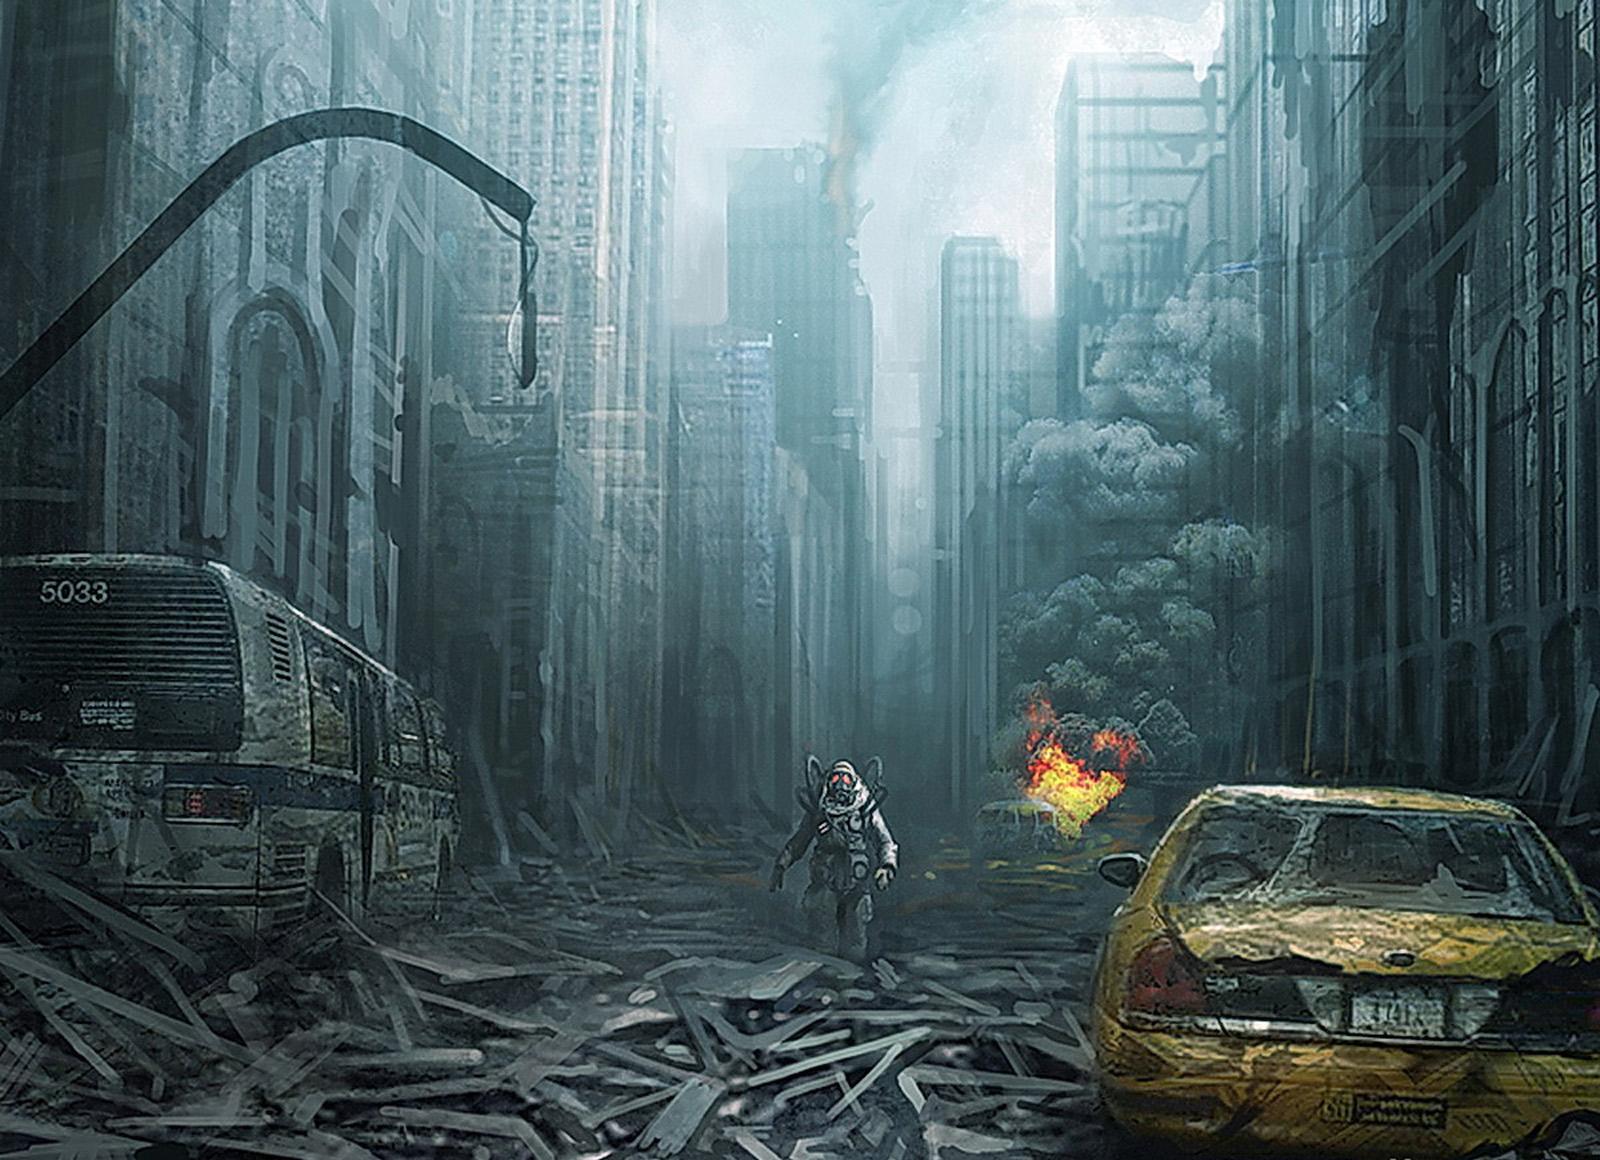 Doomsday Destruction Images Art Of Doom Hd Wallpaper And Background